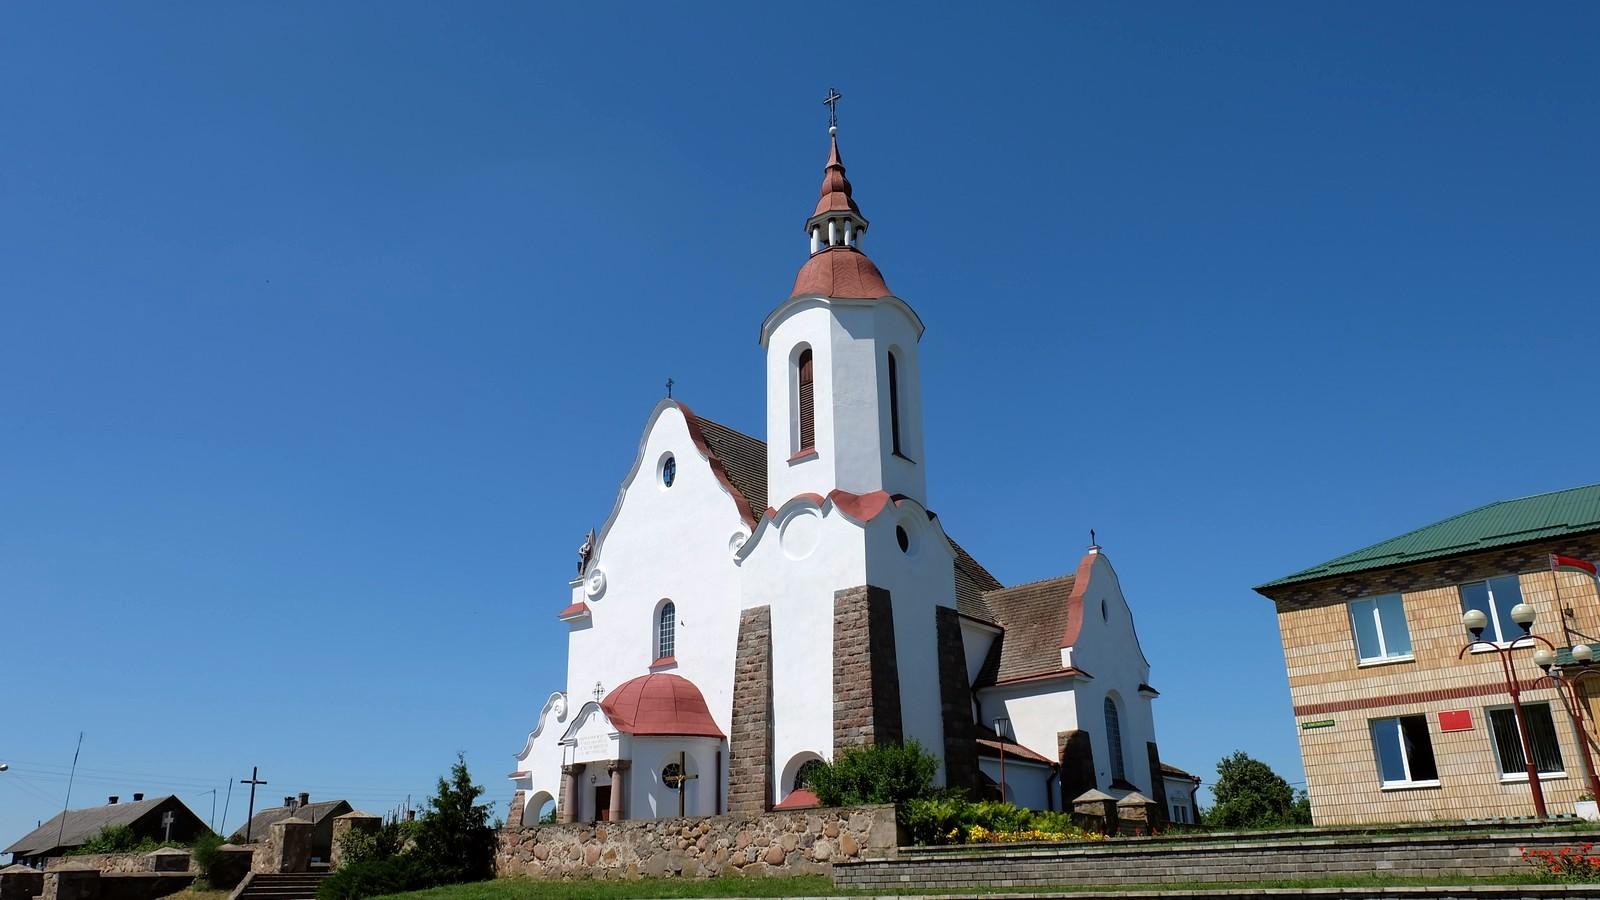 Костёл Богоматери Руженцовой, Солы, Беларусь